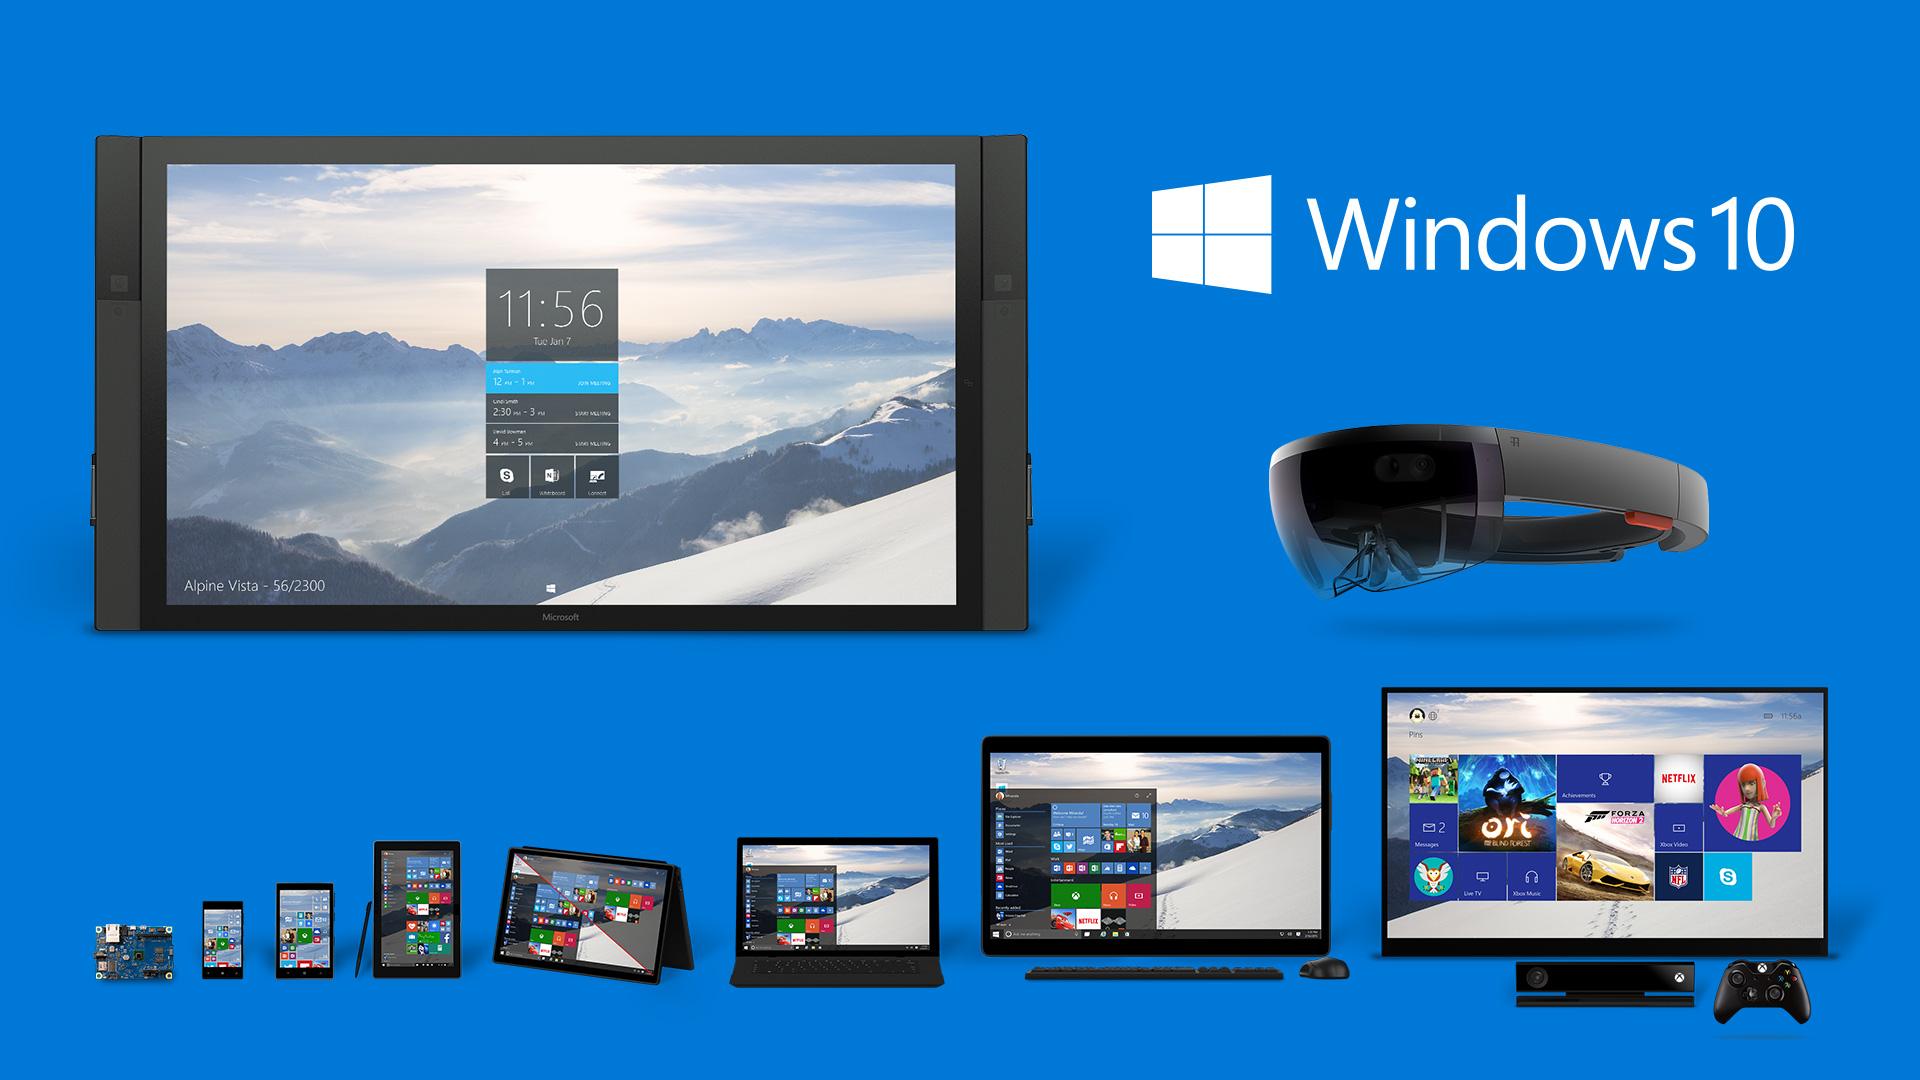 Windows 10 windows 10: the premium of free upgrades, in the 1st year of release Windows 10: The Premium of Free Upgrades, In the 1st Year of Release windows 10